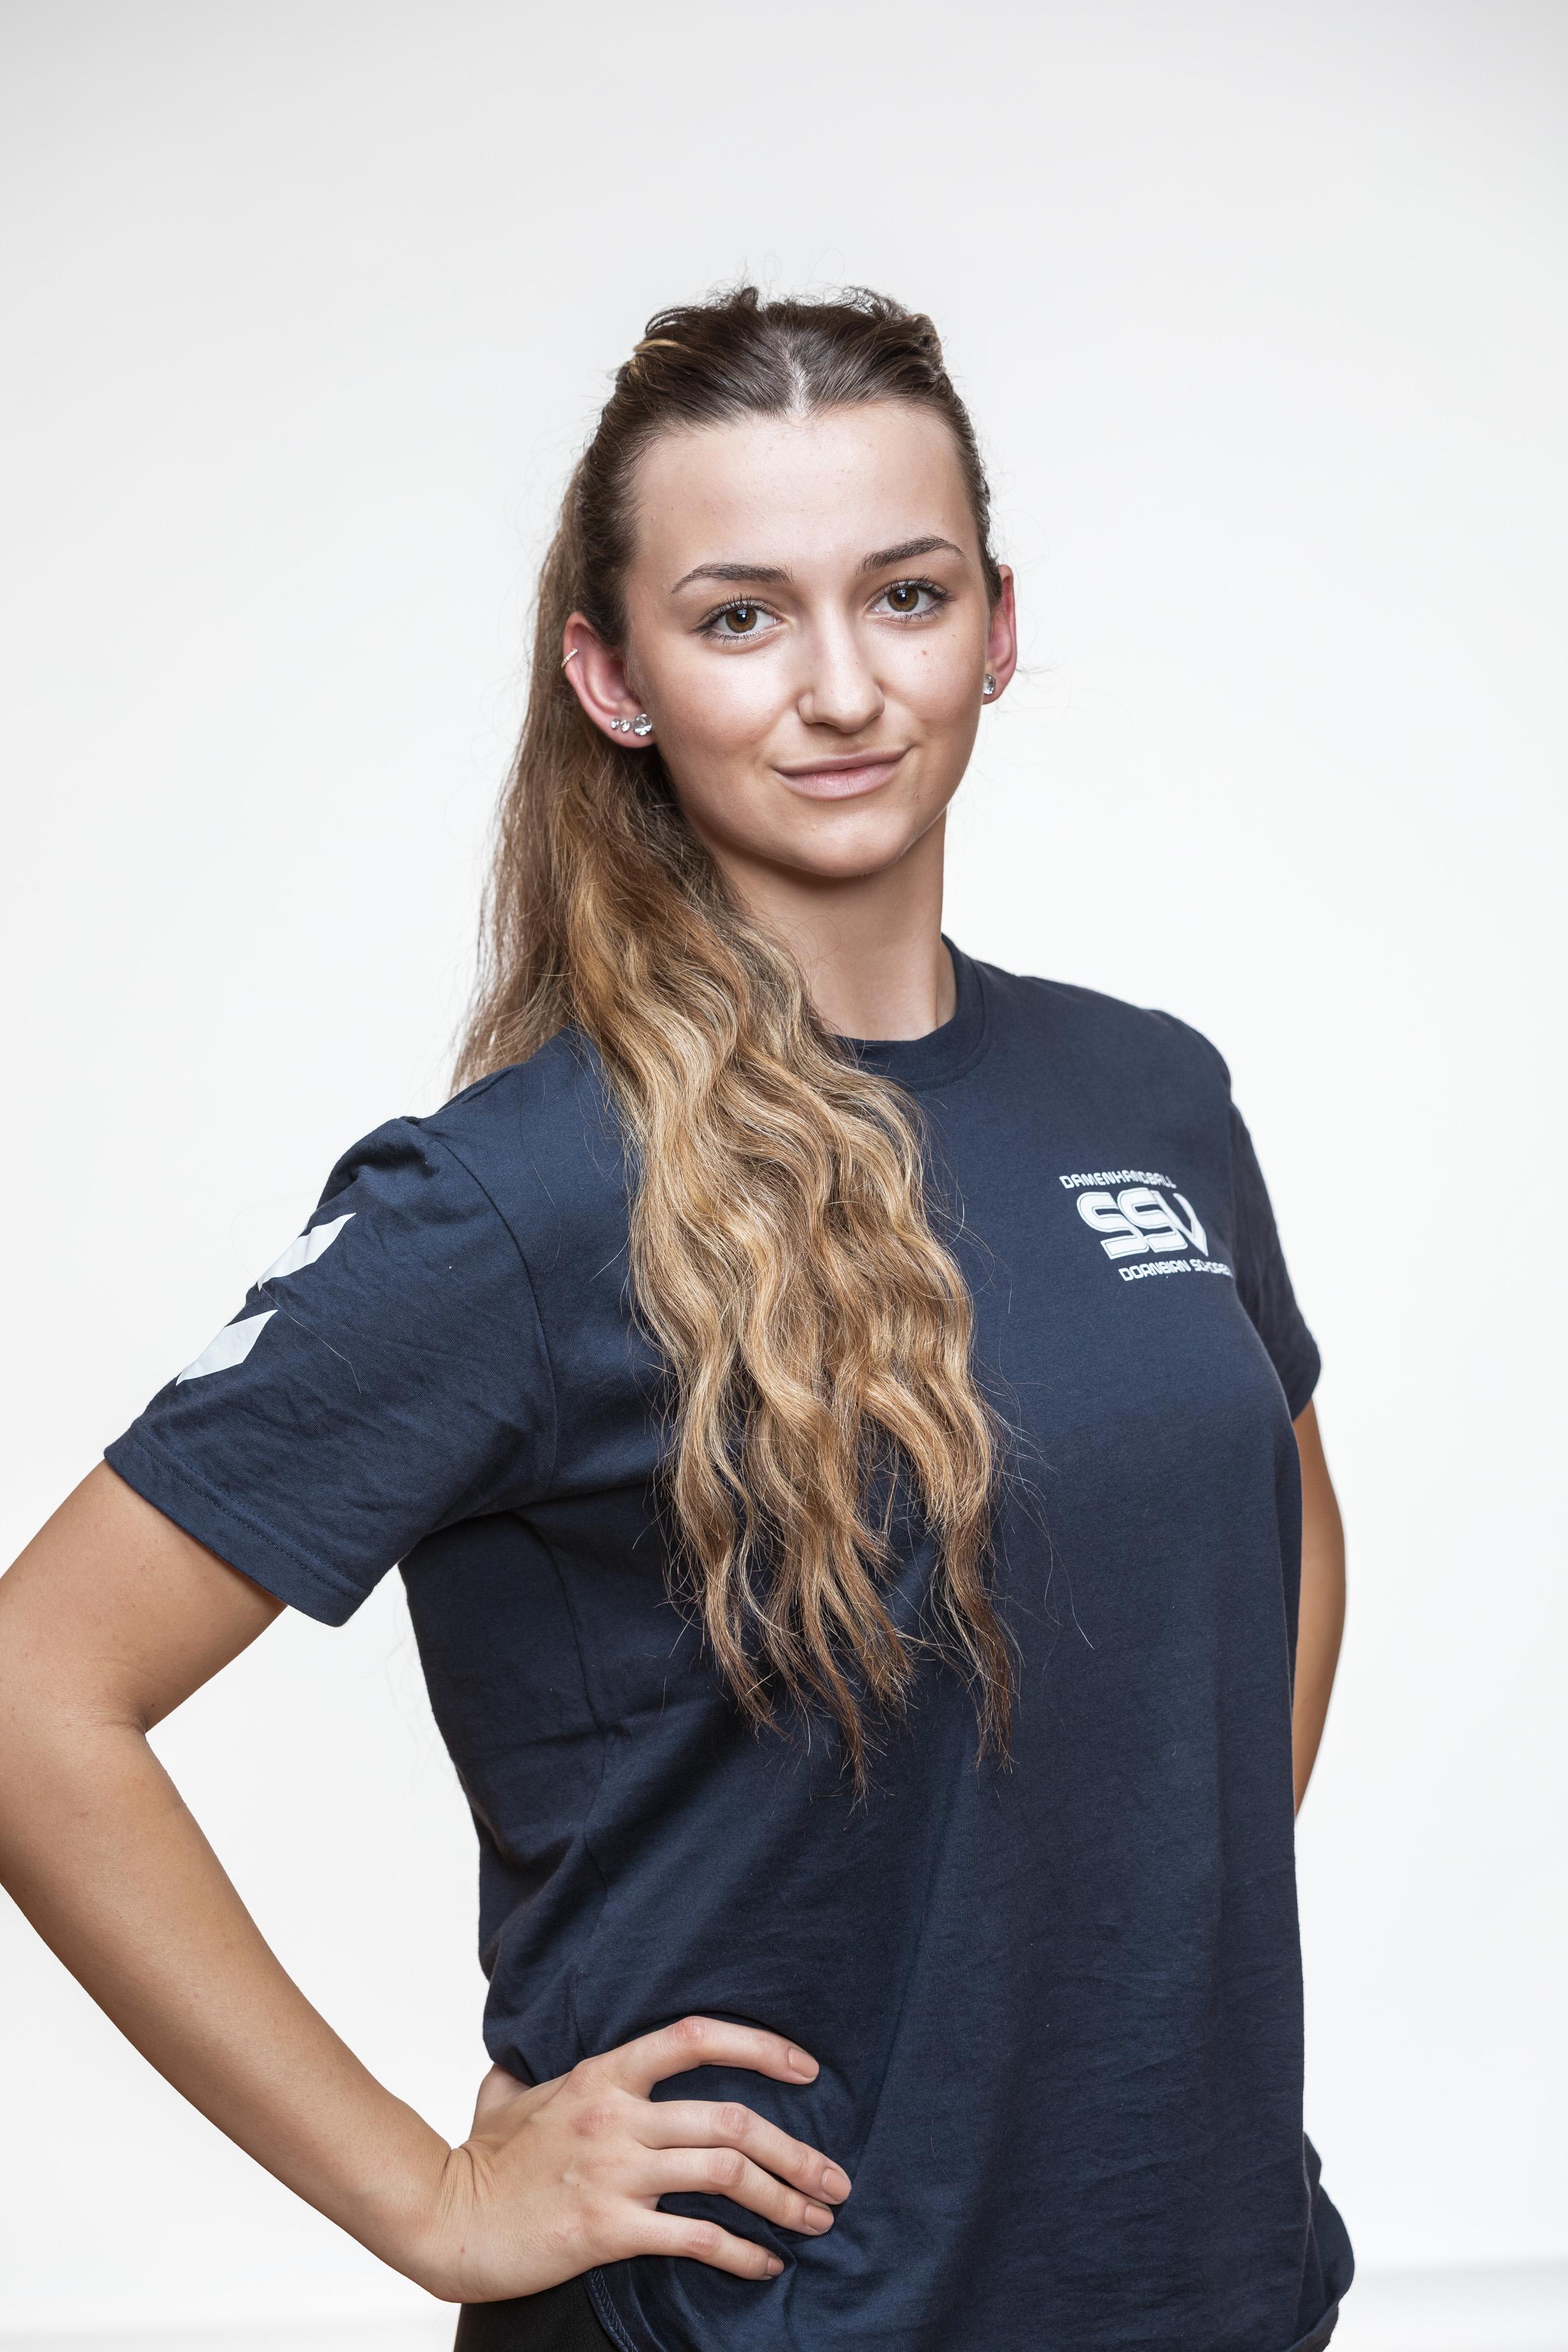 Martina Milicevic